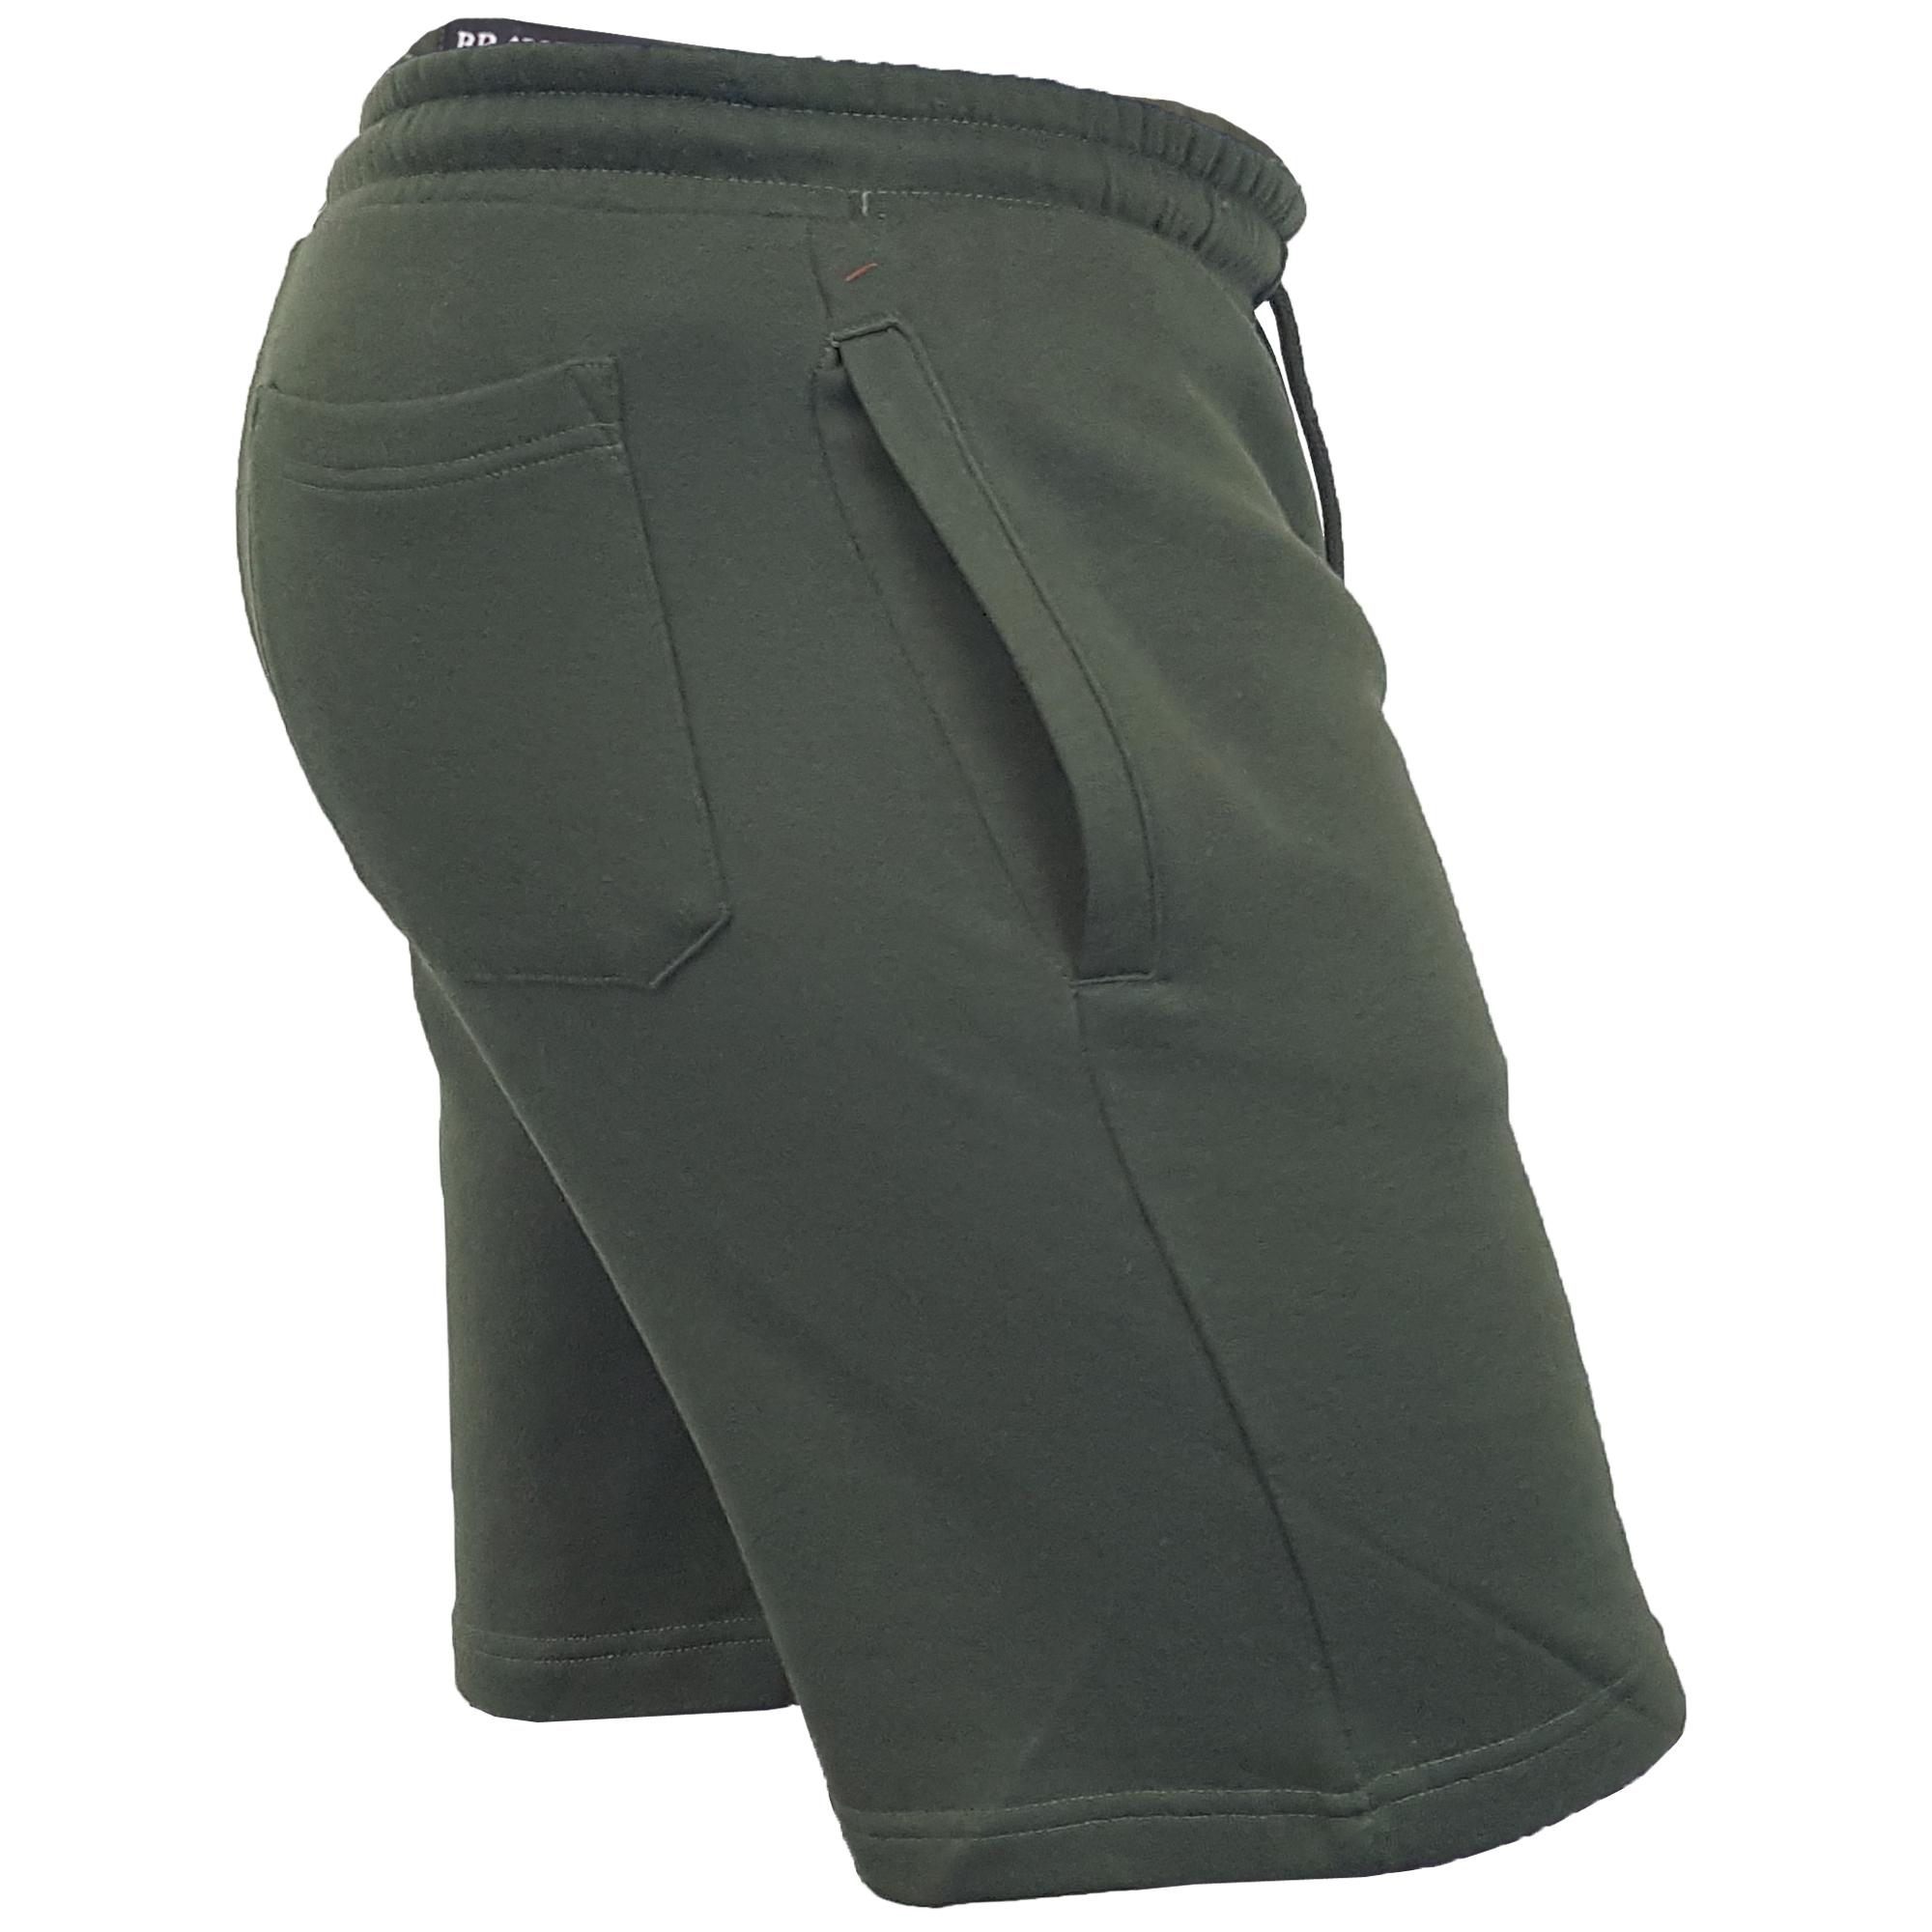 Mens-Jogger-Shorts-Tarley-by-Brave-Soul-Knee-Length-Casual-Fleece-Lined-Summer thumbnail 10